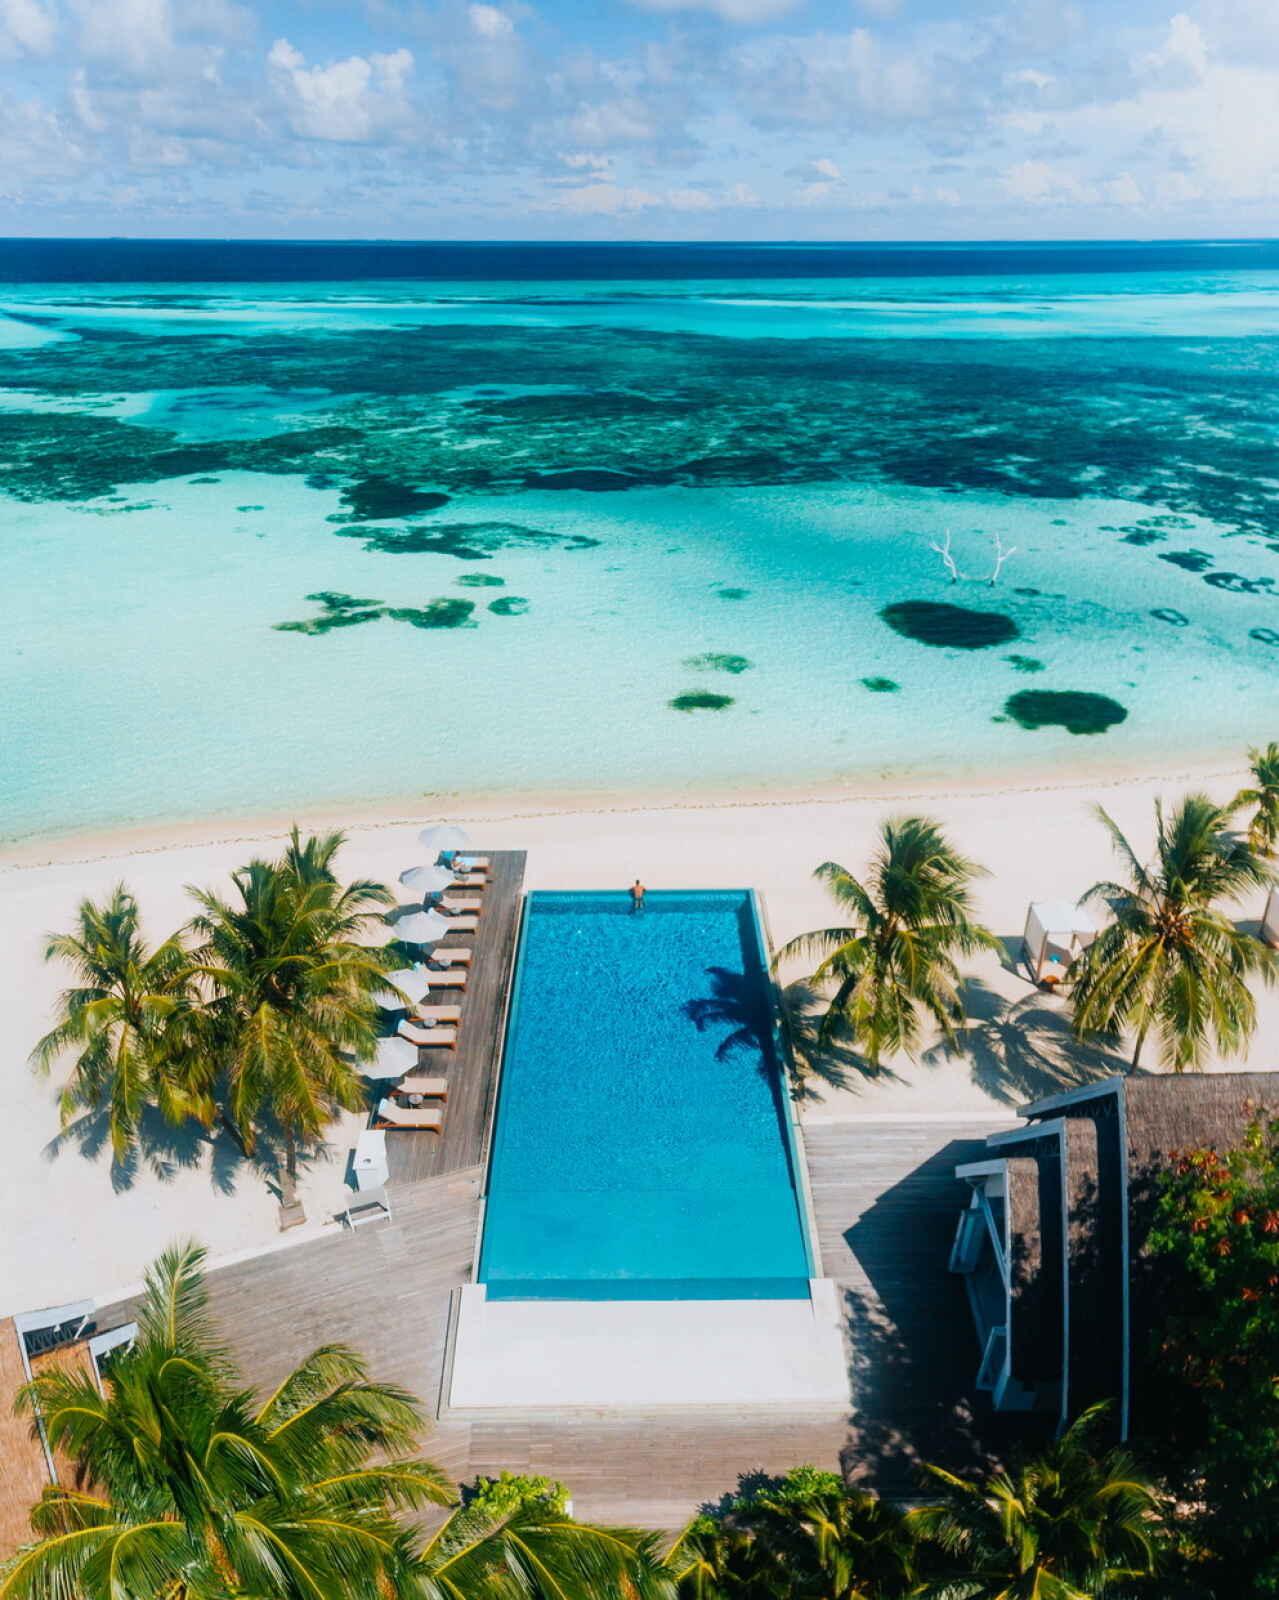 Maldives : LUX* South Ari Atoll Resort & Villas